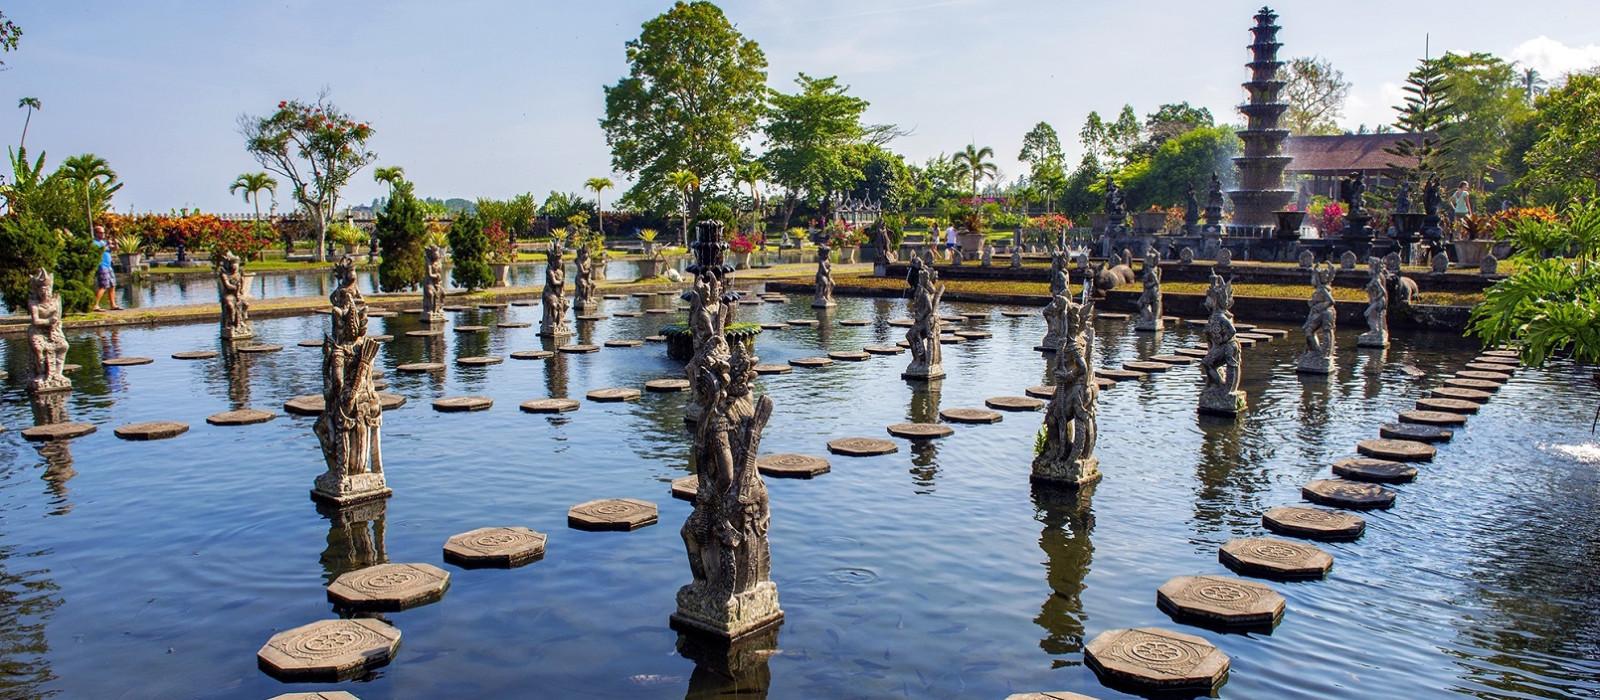 Tirtagangga Bali trip - Things to do in Indonesia